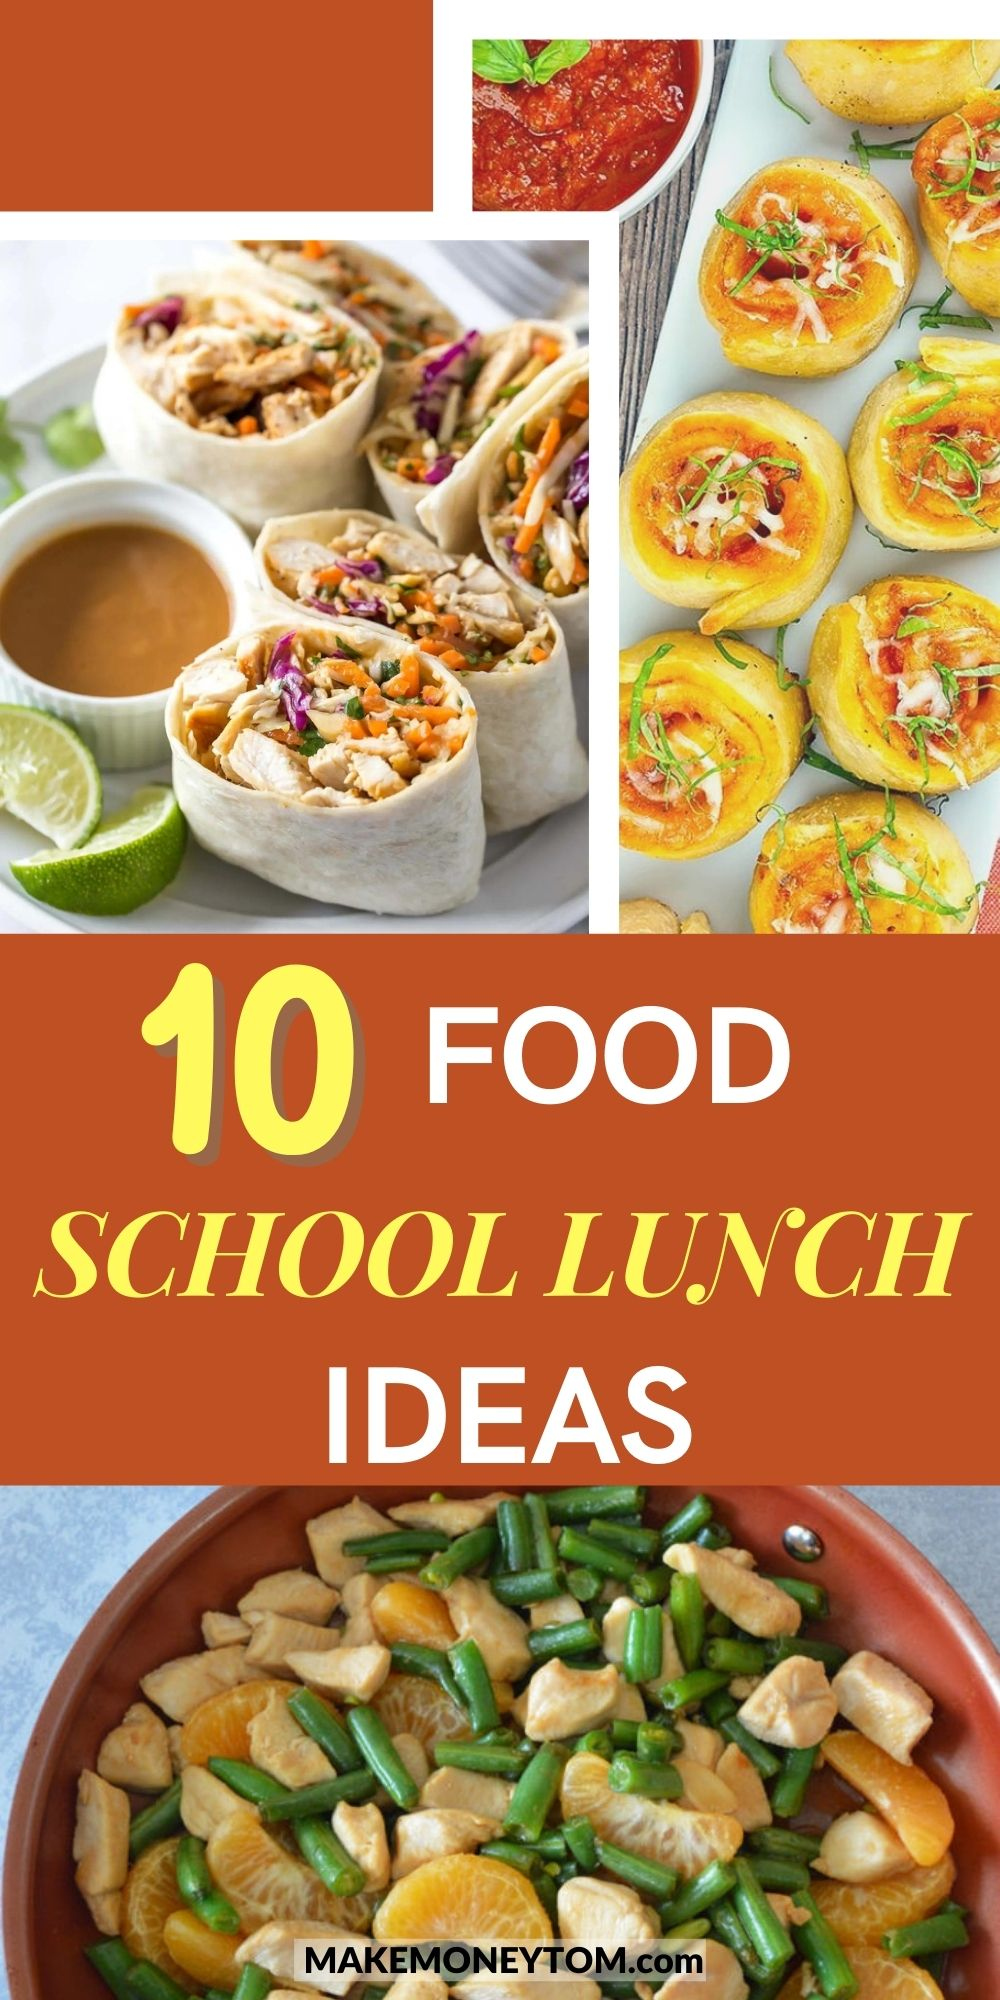 10 Hot Food School Lunch Ideas + Healthy Lunch Recipes